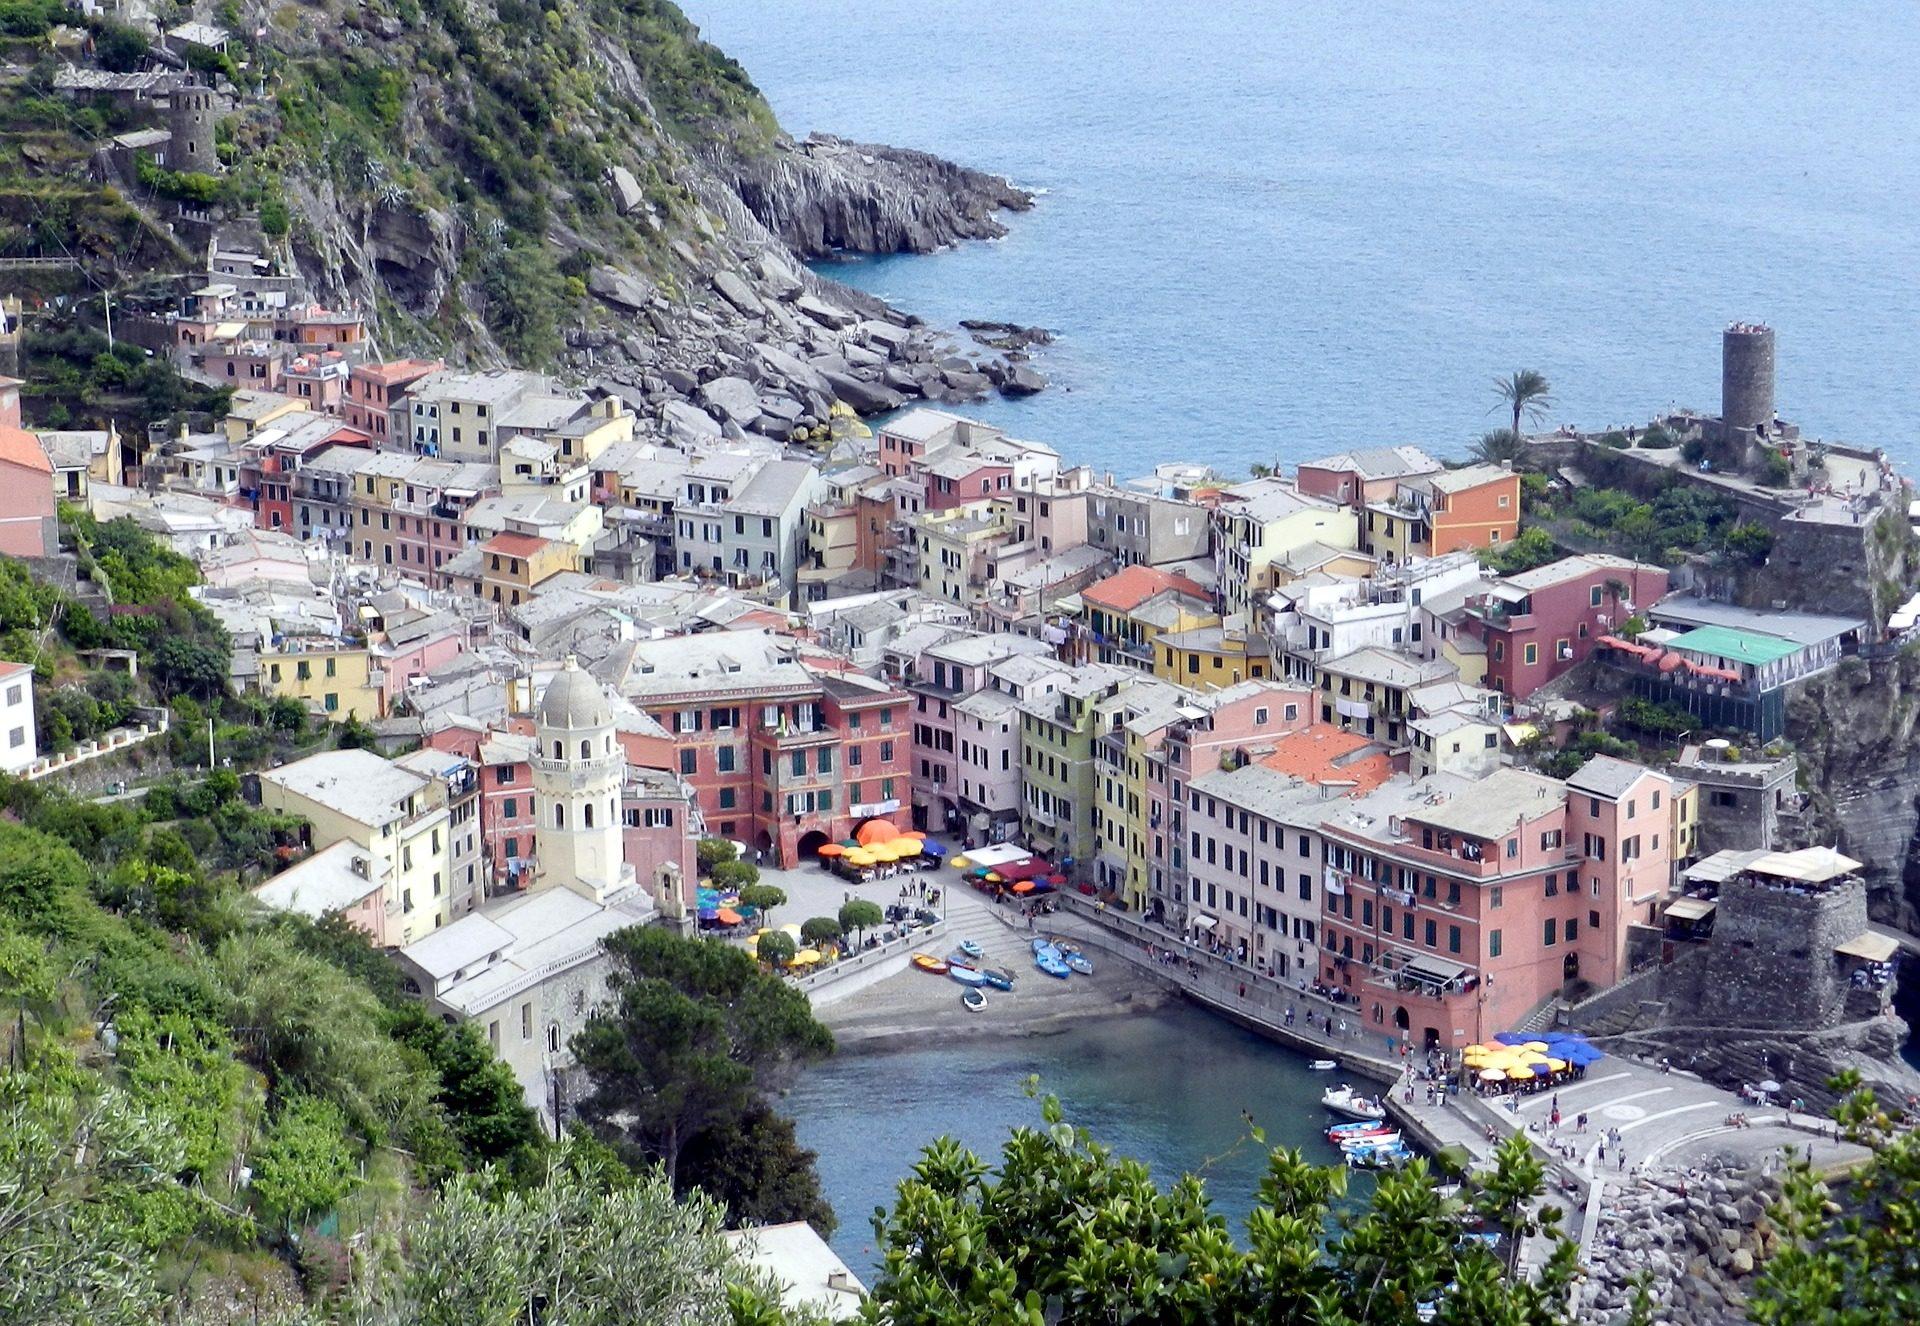 pueblo, casas, puerto, mar, montaña, liguria, italia - Fondos de Pantalla HD - professor-falken.com